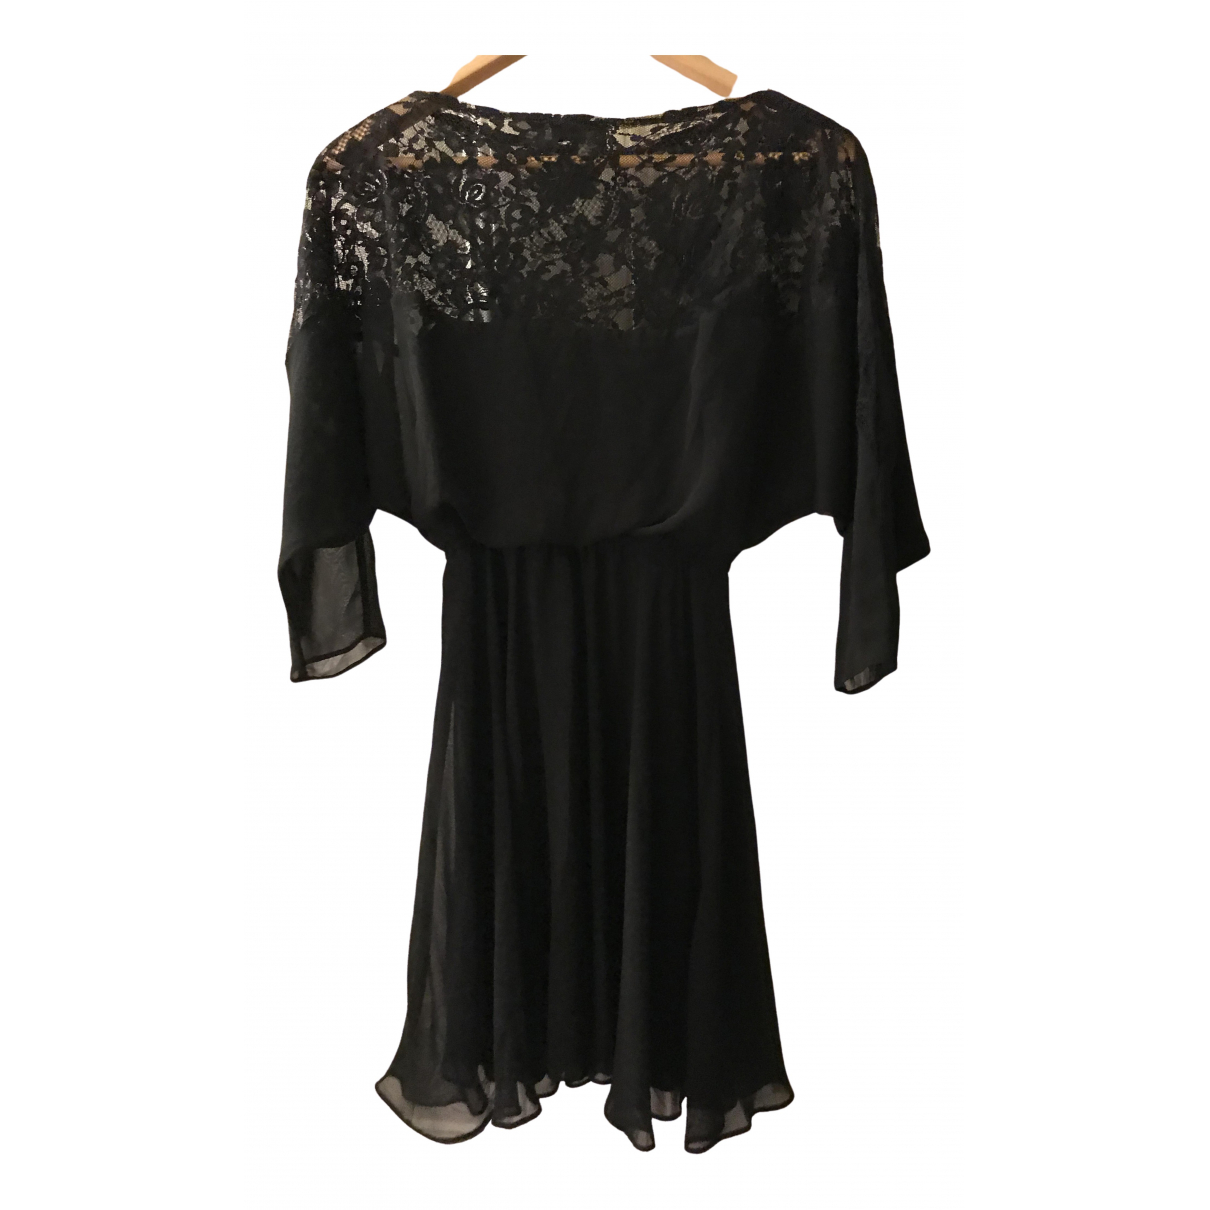 Asos \N Kleid in  Schwarz Polyester